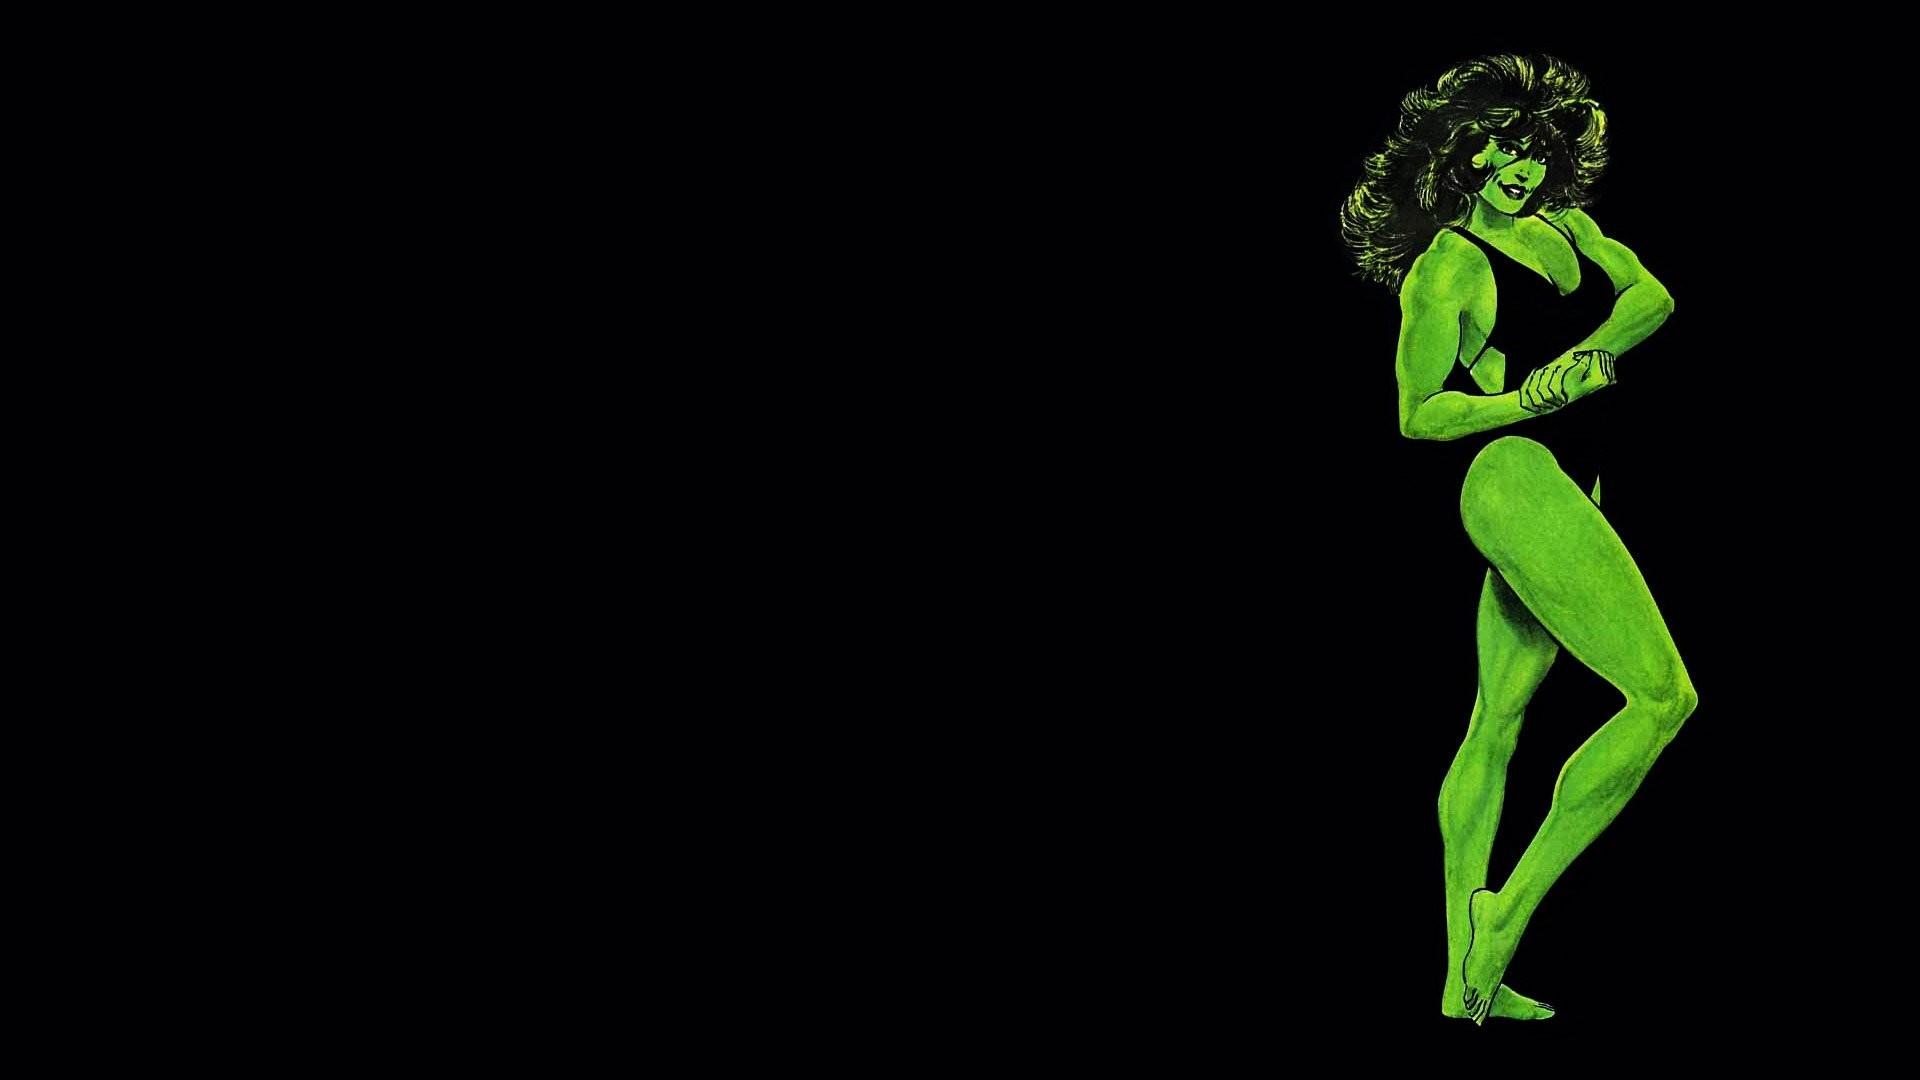 255 <b>Hulk HD Wallpapers</b> | Backgrounds – <b